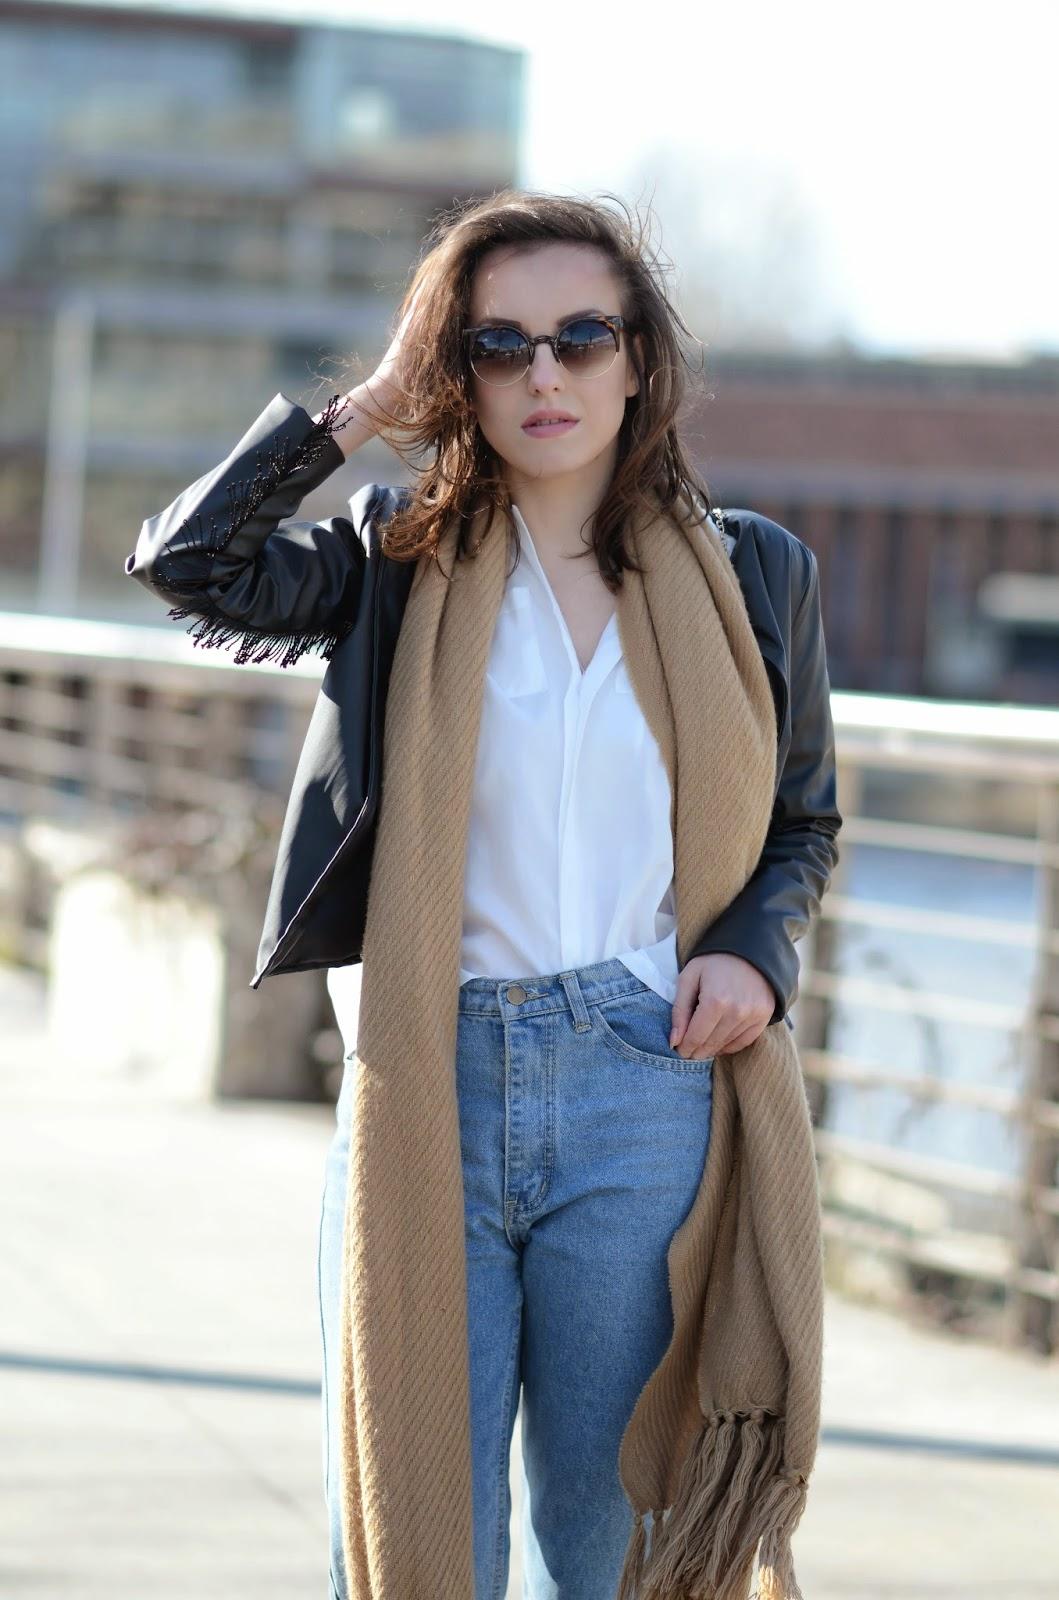 street style, boyfriend jeans, spring 2015 trends